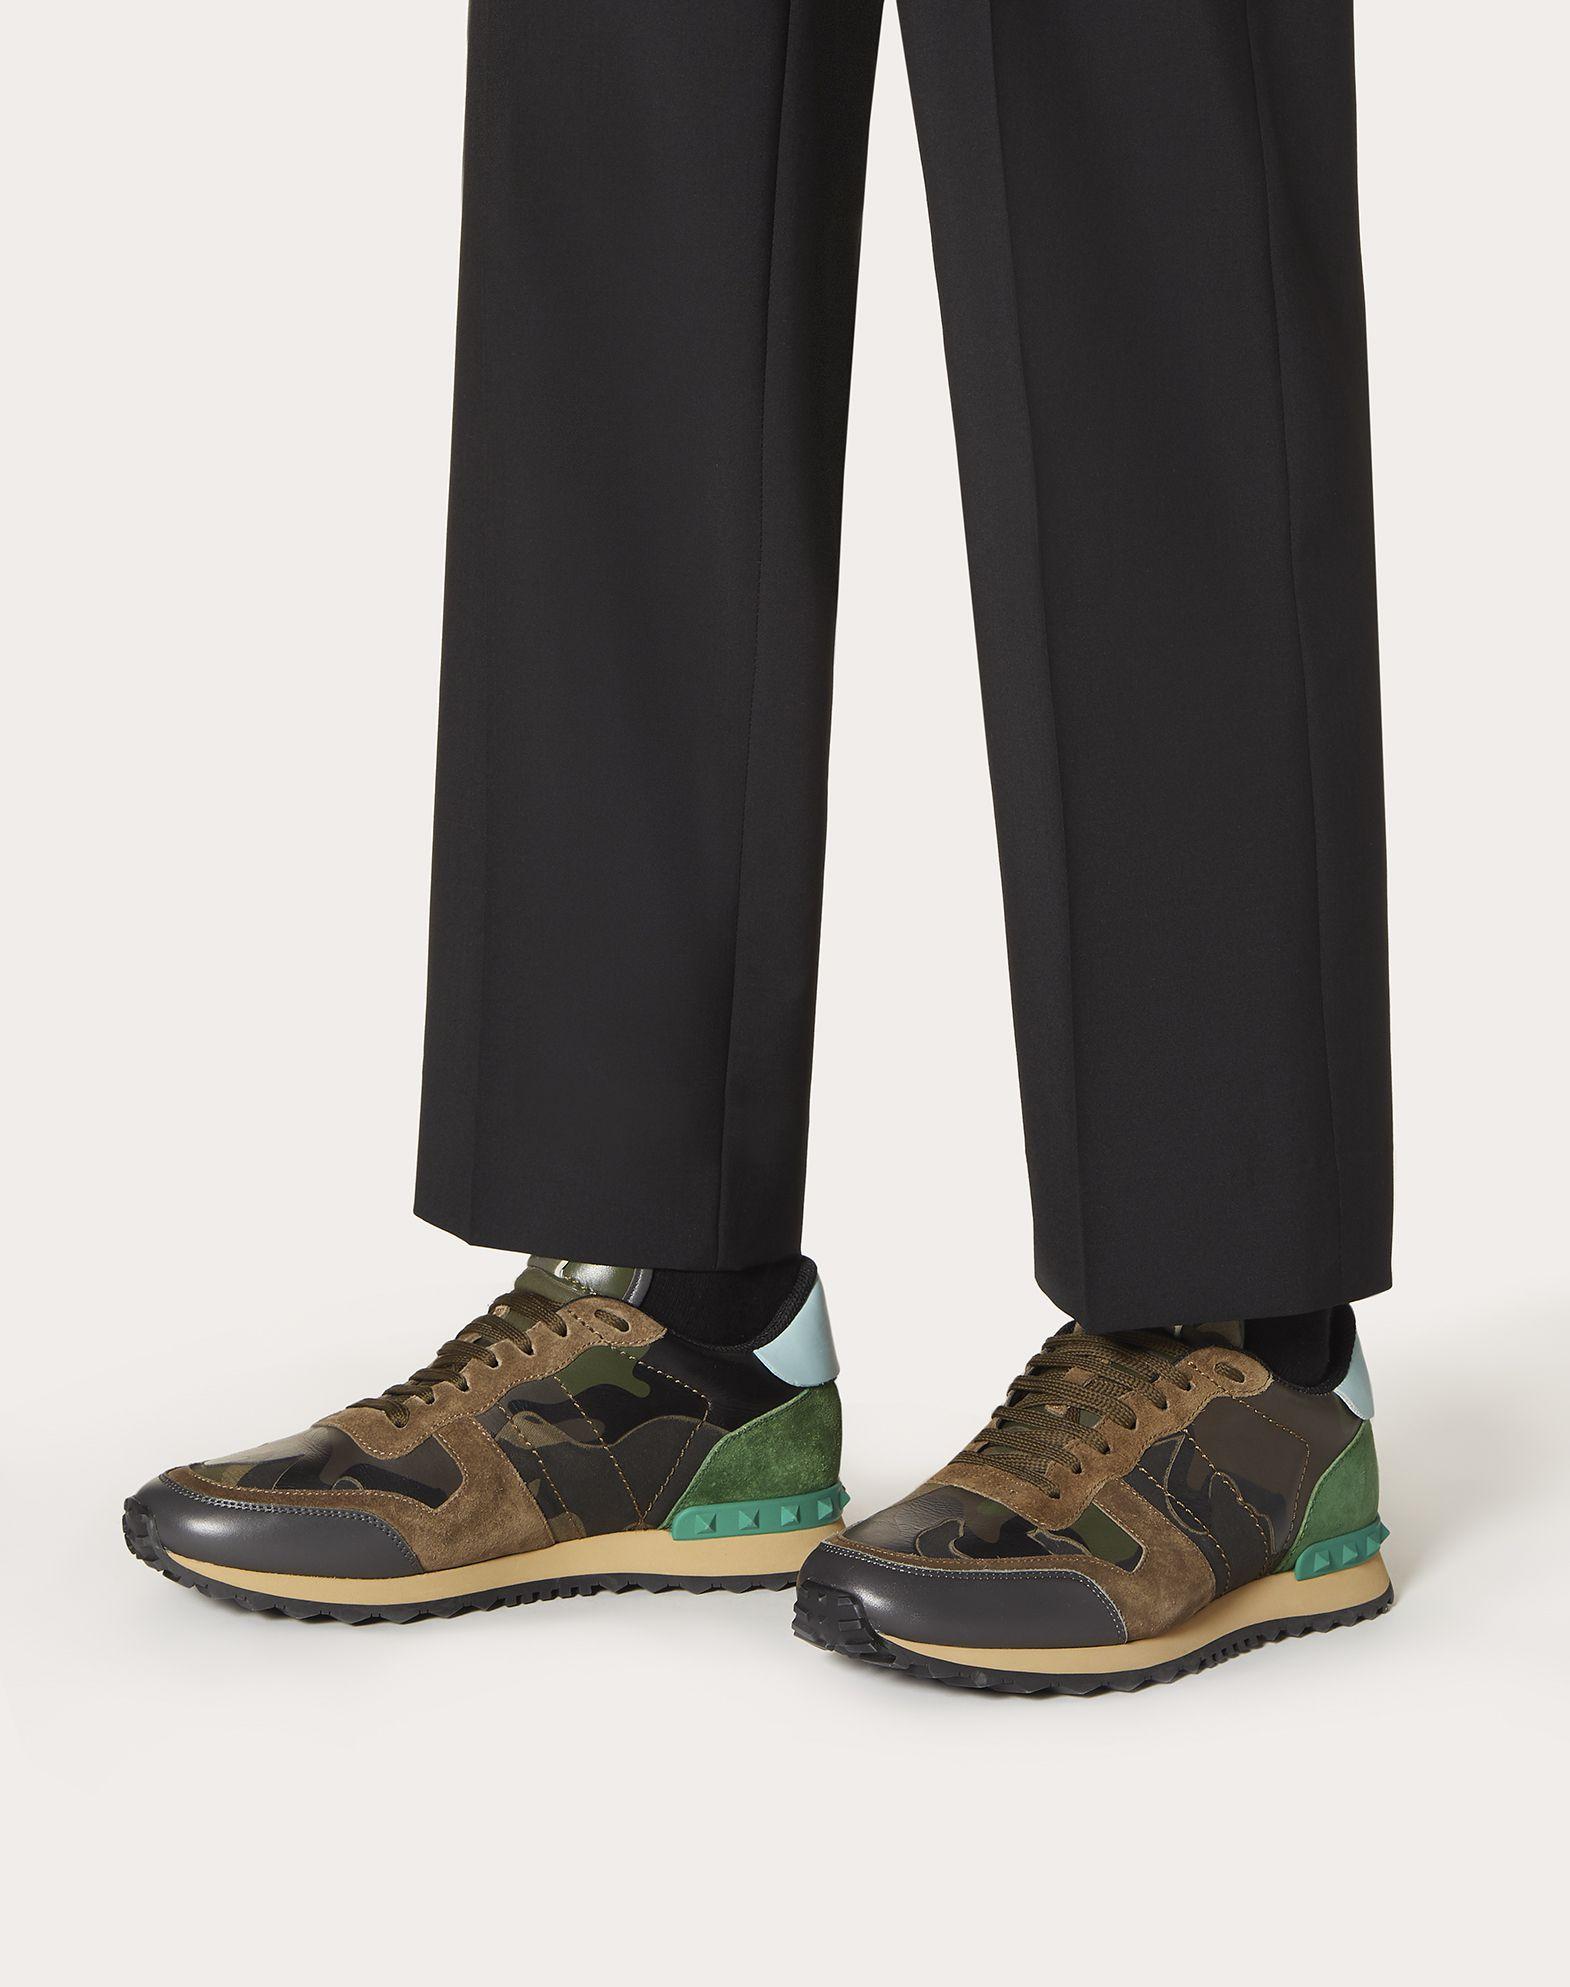 VALENTINO GARAVANI UOMO Sneaker Rockrunner Camouflage LOW-TOP SNEAKERS U b